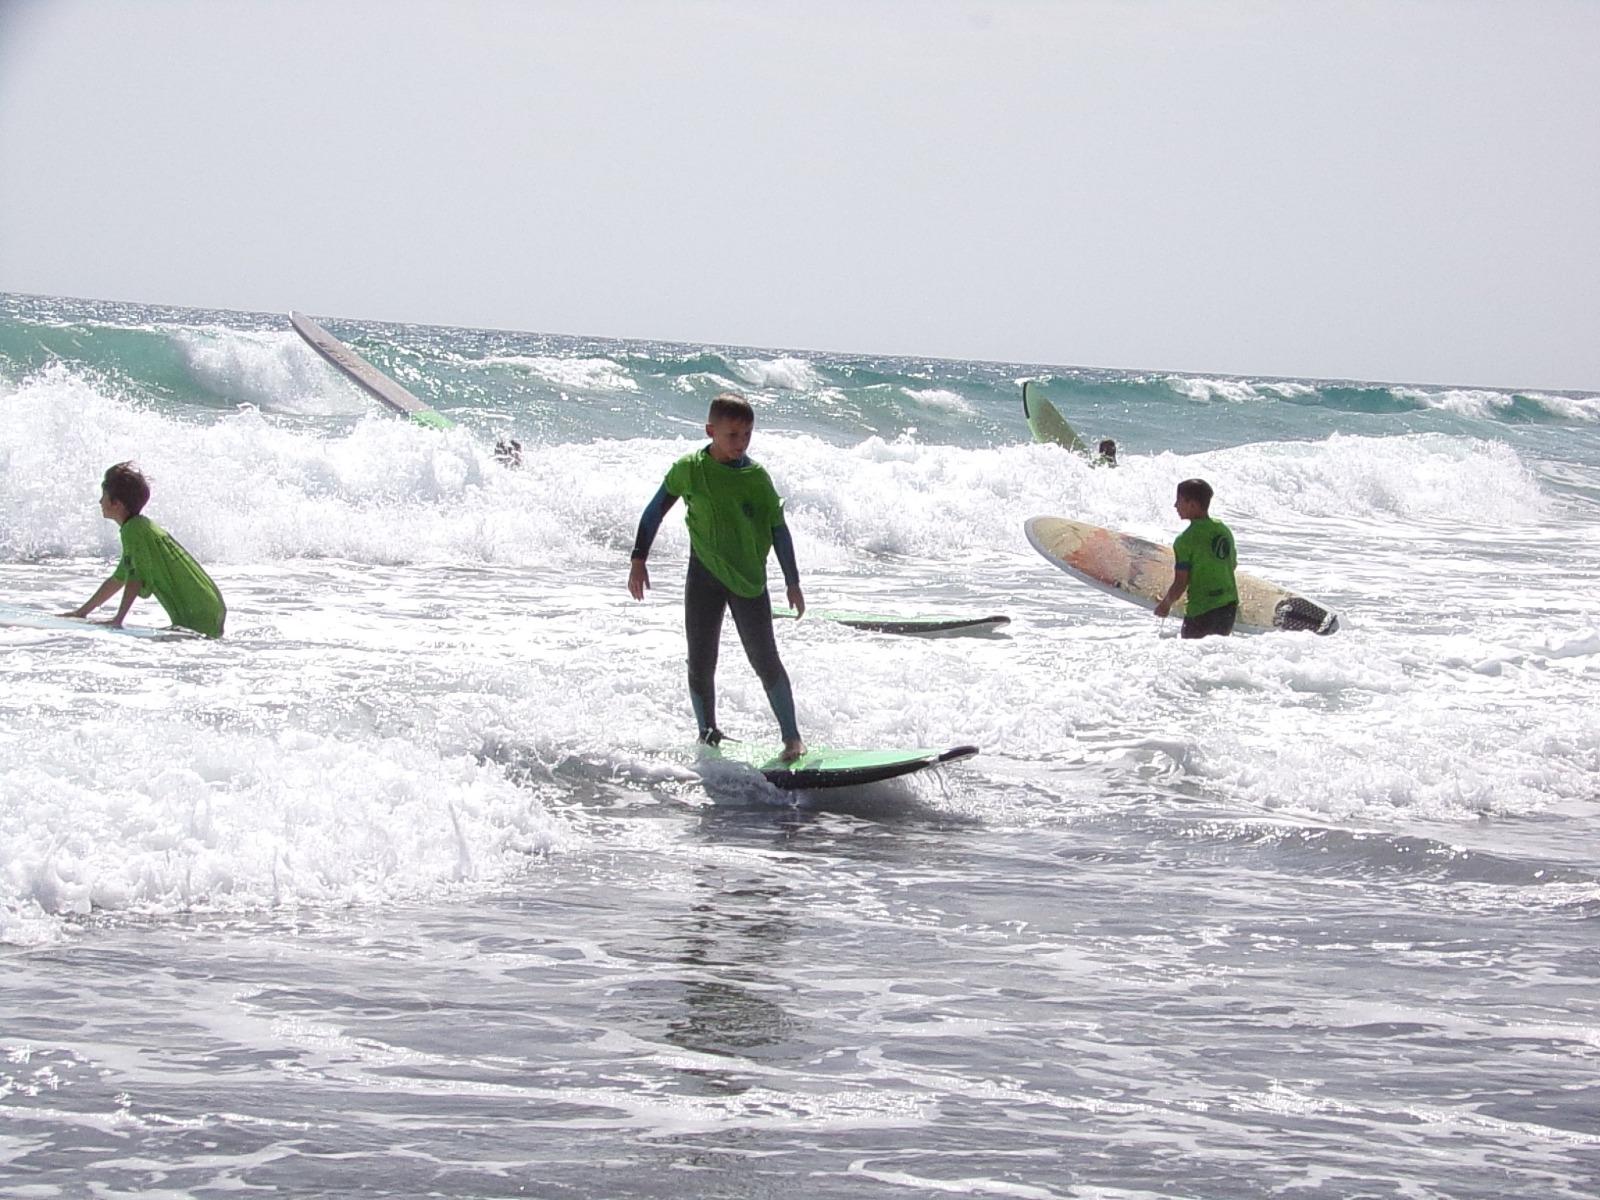 VERANO 2019 2 FUERTE TRIBU SURFWhatsApp Image 2019-08-15 at 15.49.34.jpeg